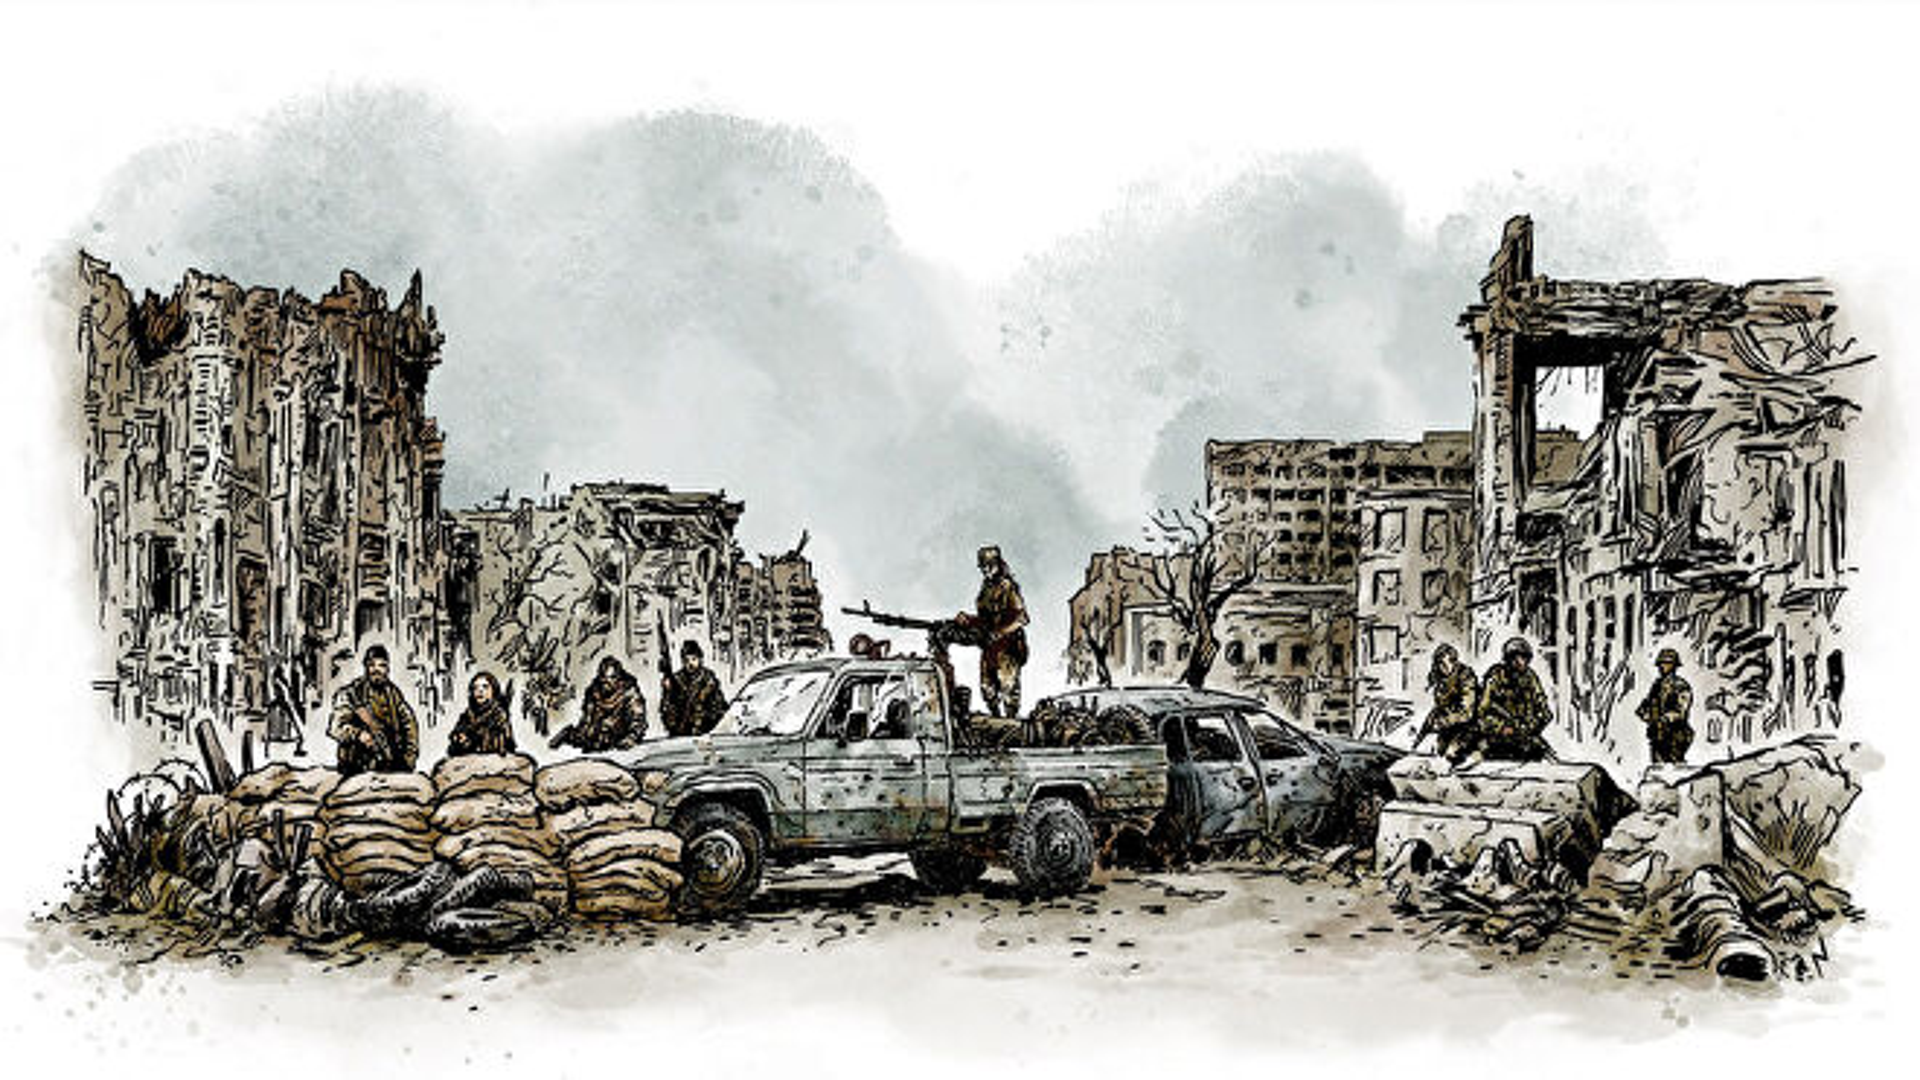 twilight-2000-4e-tabletop-rpg-roadblock-art.jpg